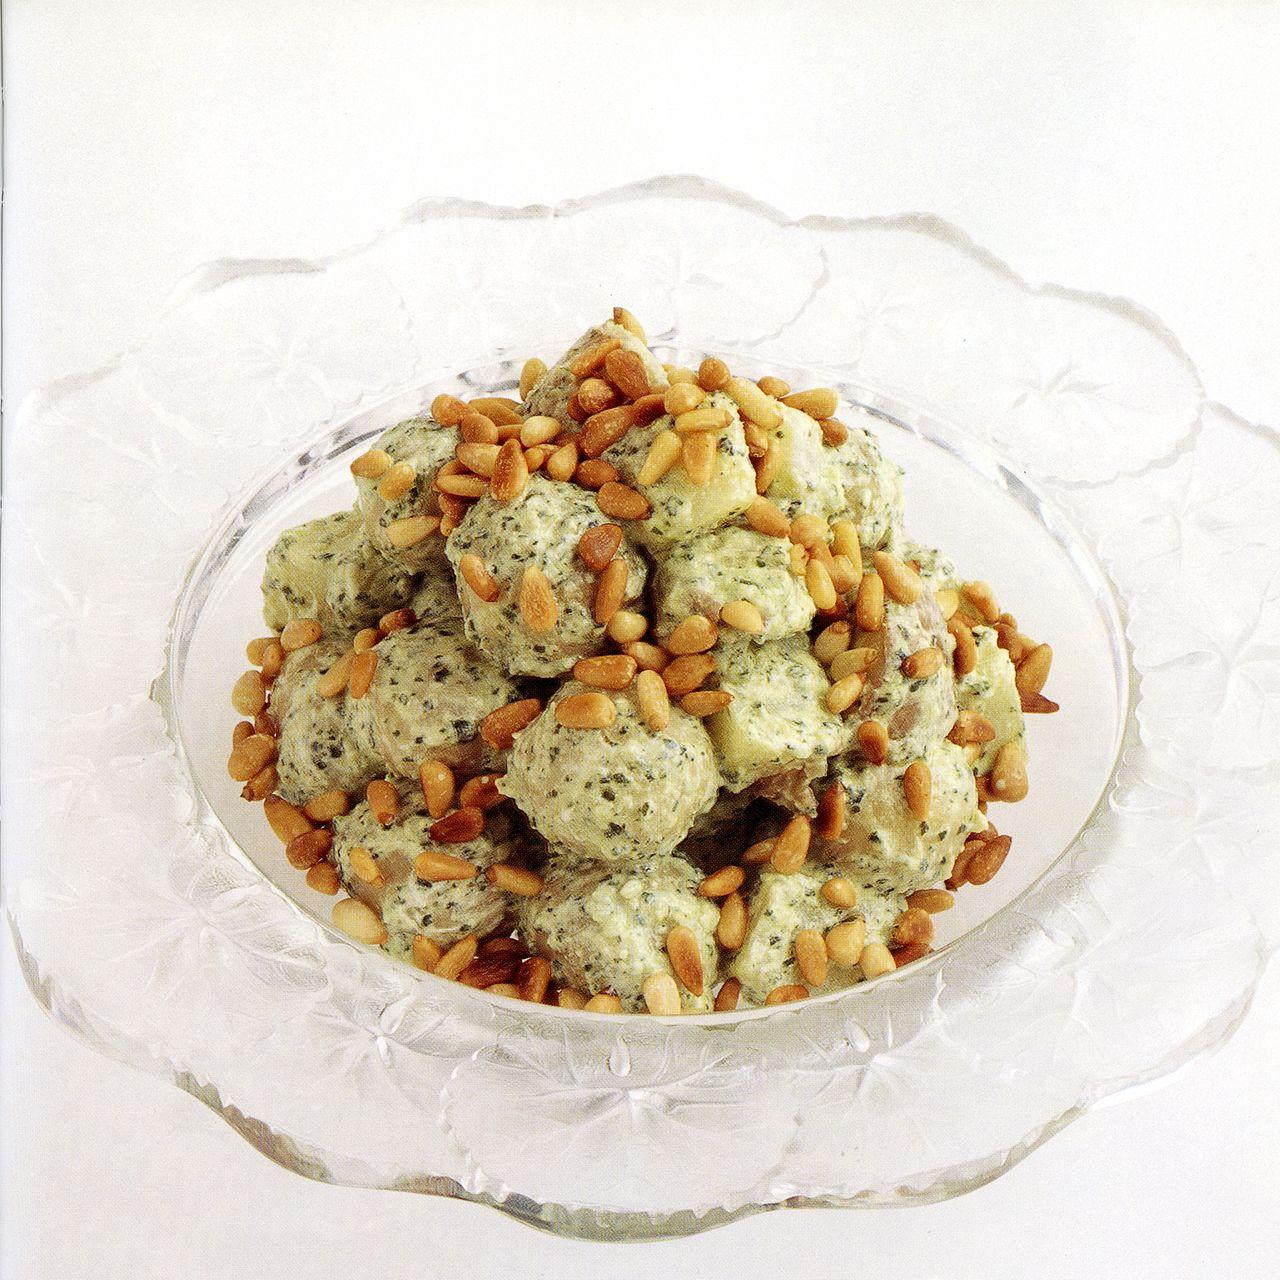 Mixed Potato Salad with Mint Pesto Dressing